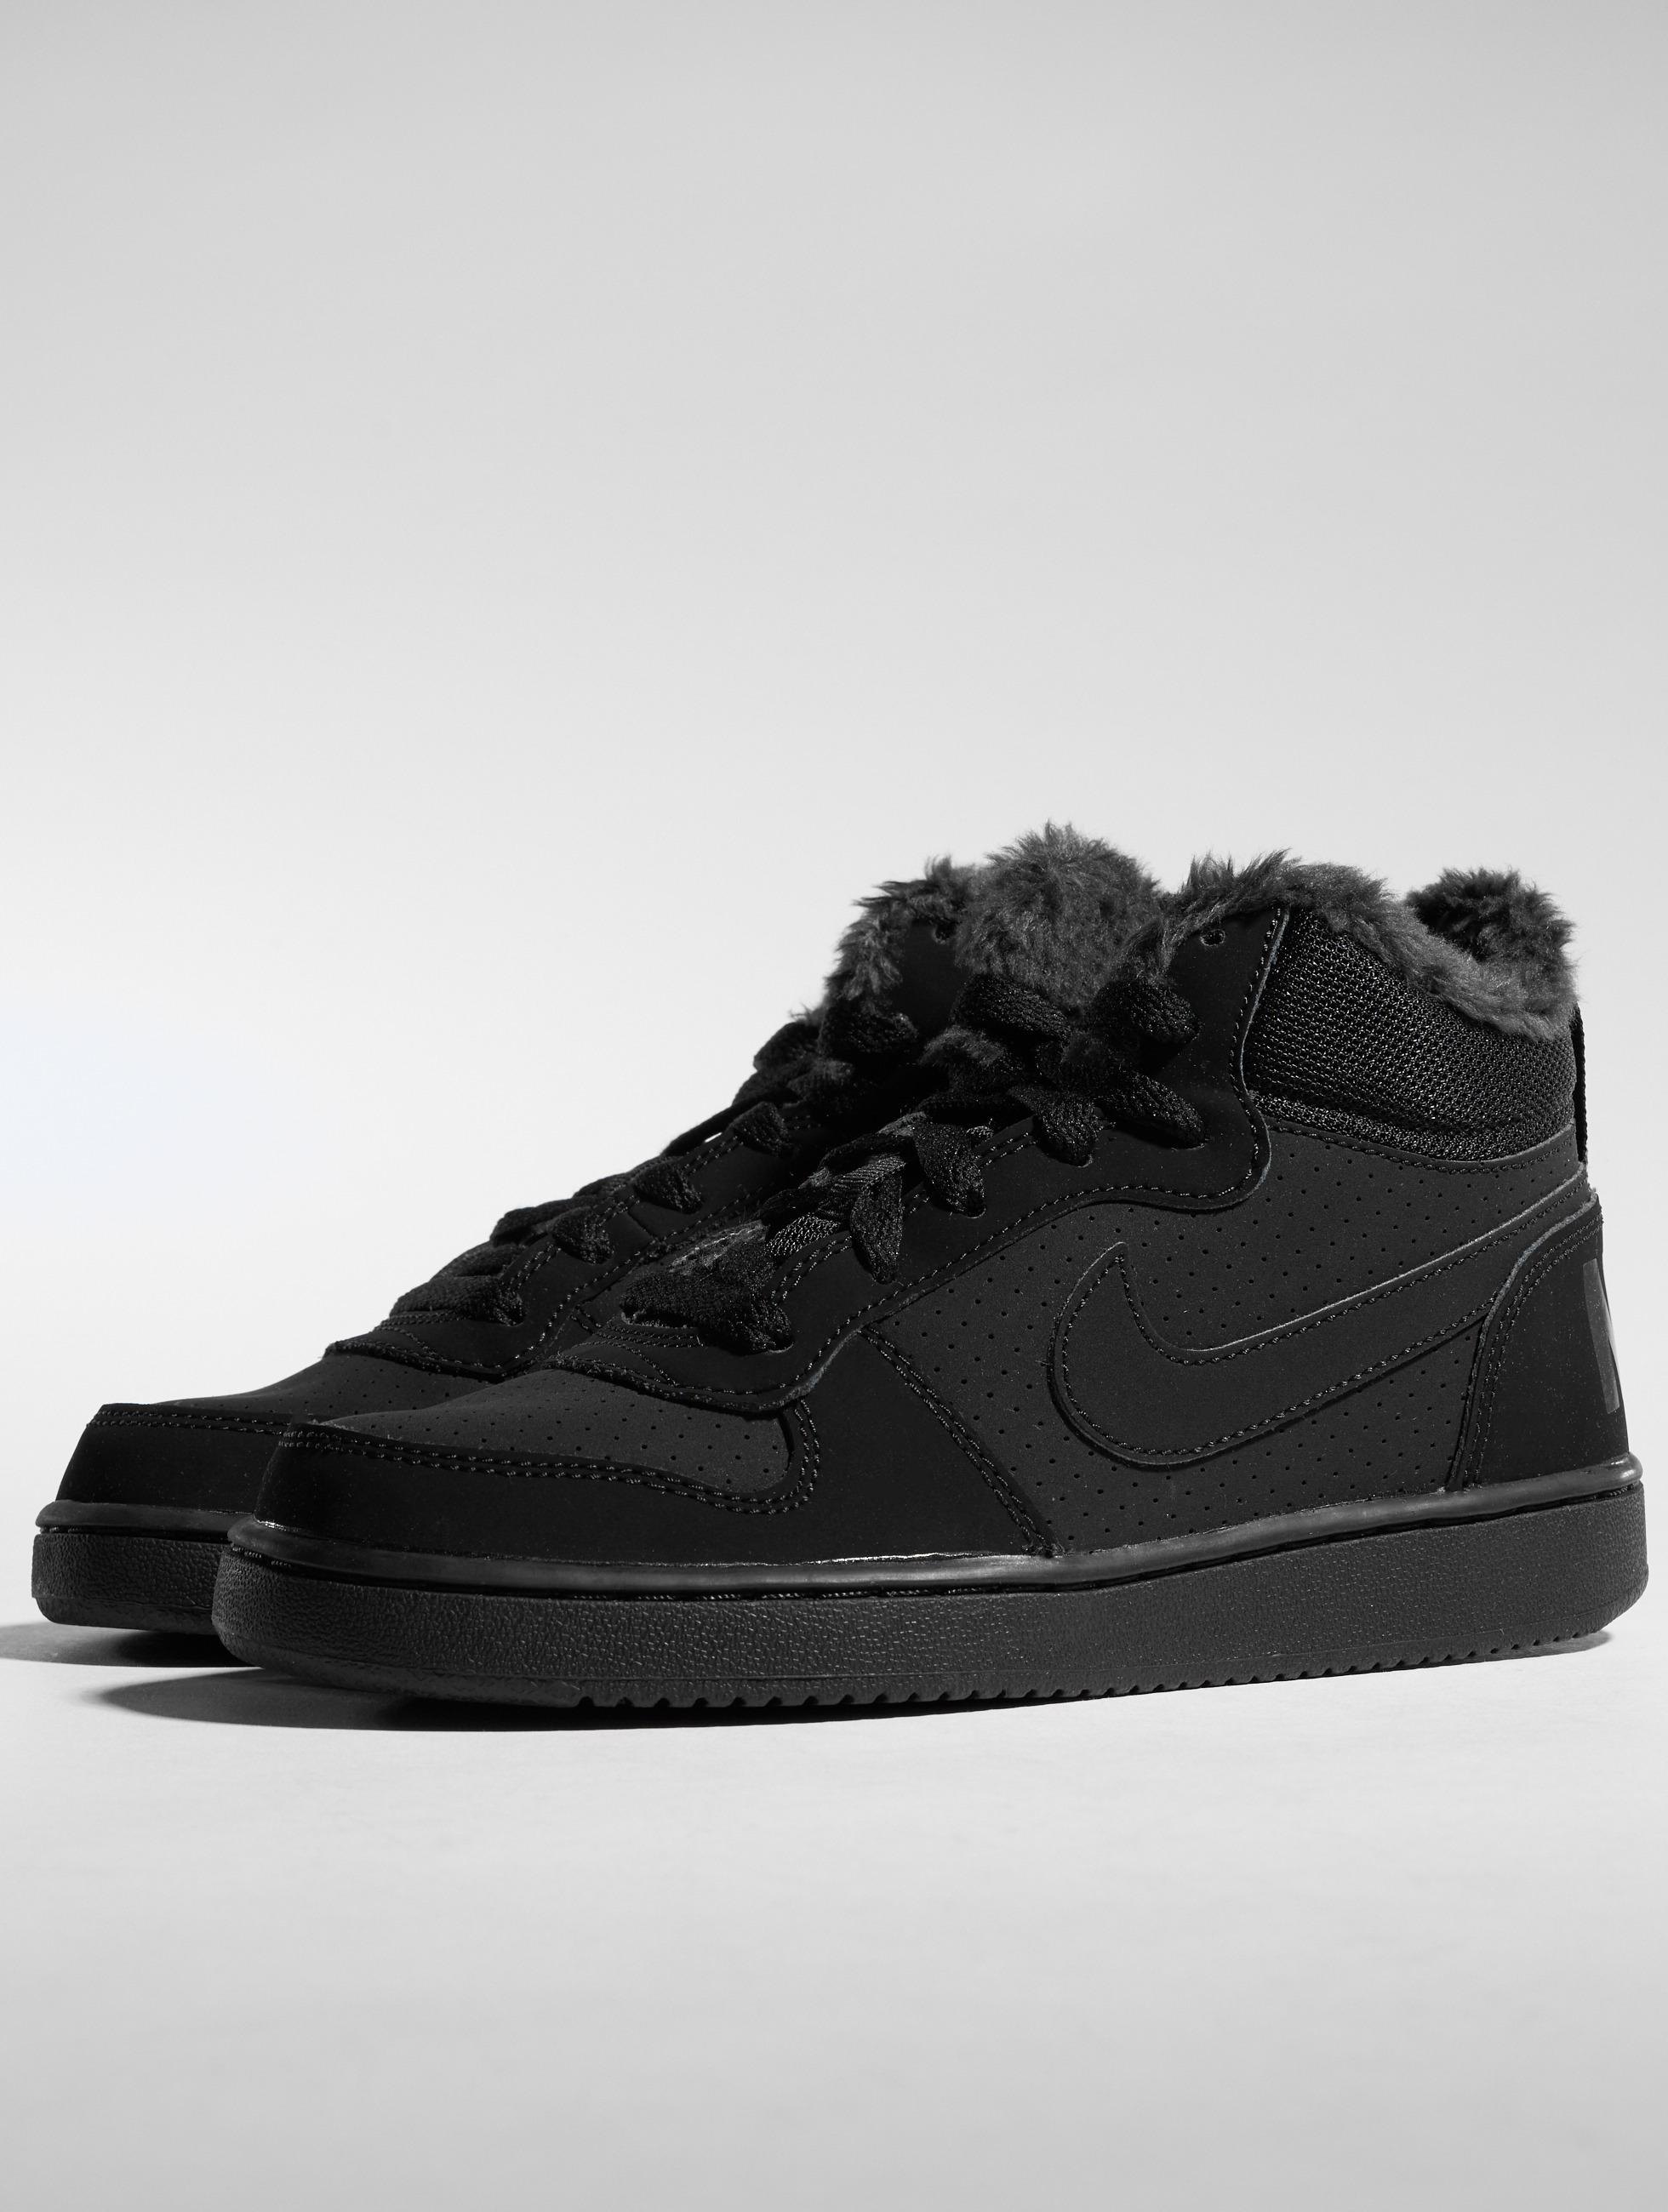 Nike Air Max 90 Mid WNTR skor Dam svart Sneakers Bästa